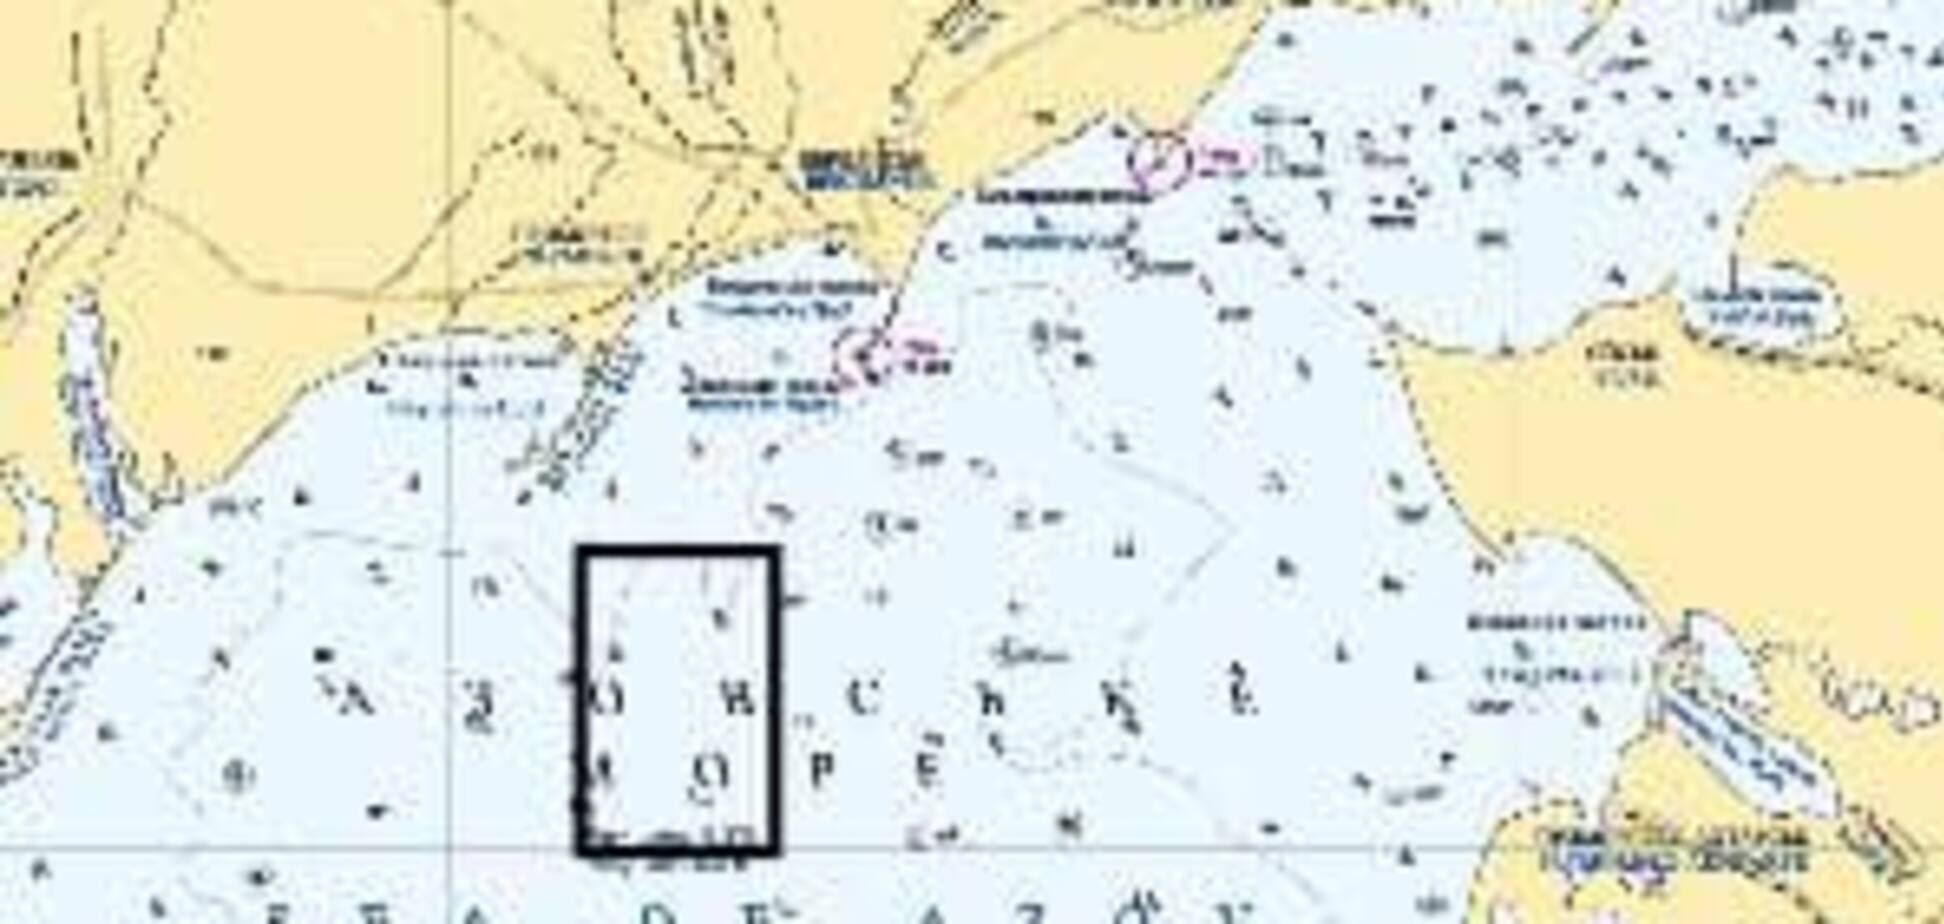 'Загроза все ближче': Росія 'замахнулася' на Азовське море